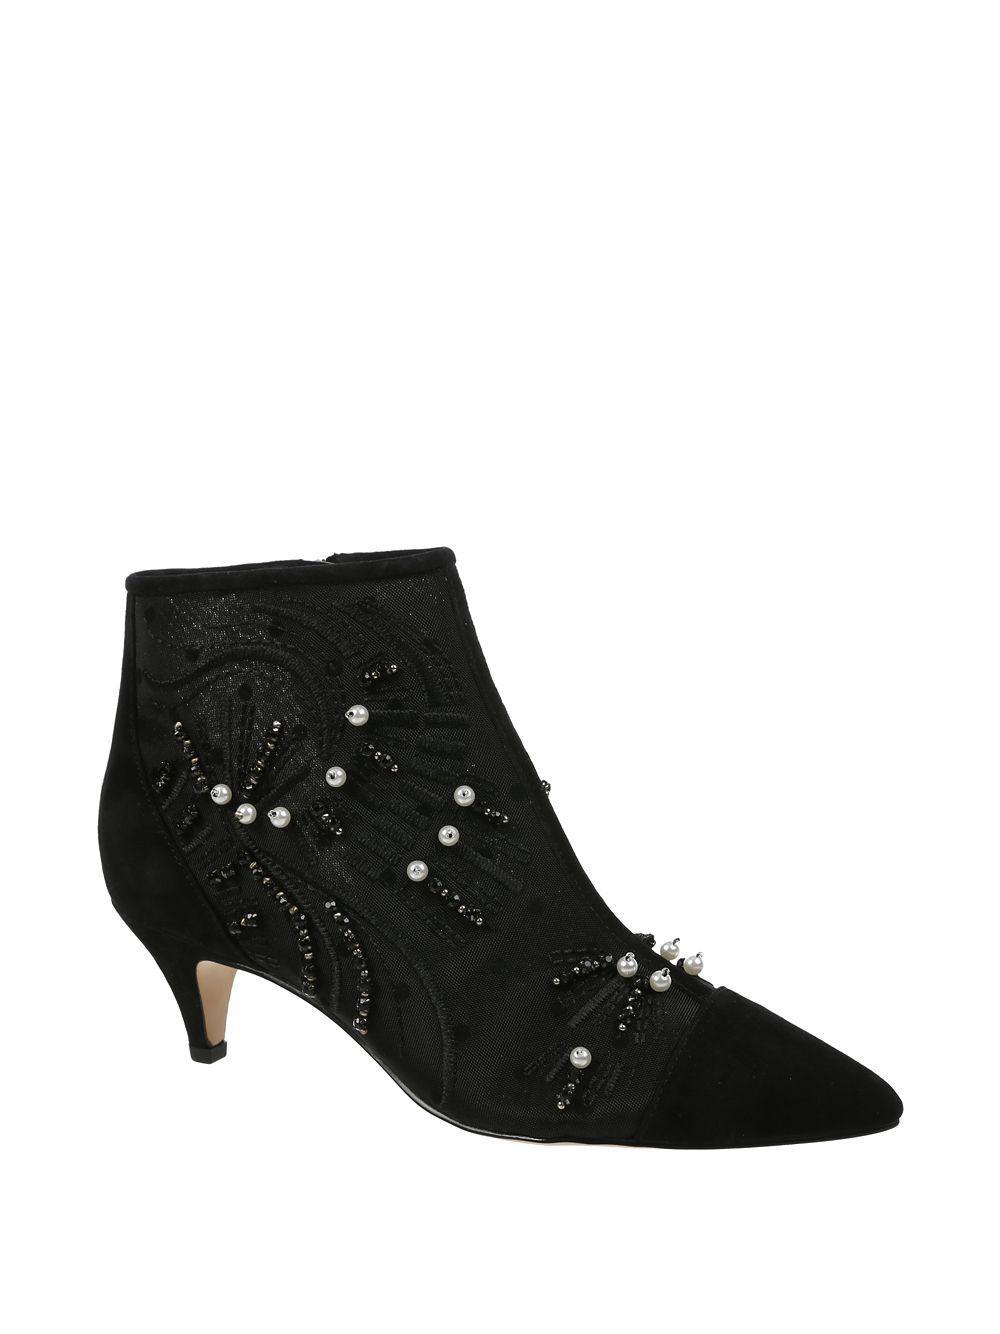 9c8c95a7b097c6 Lyst - Sam Edelman Kami Embellished Kitten Heel Booties in Black ...